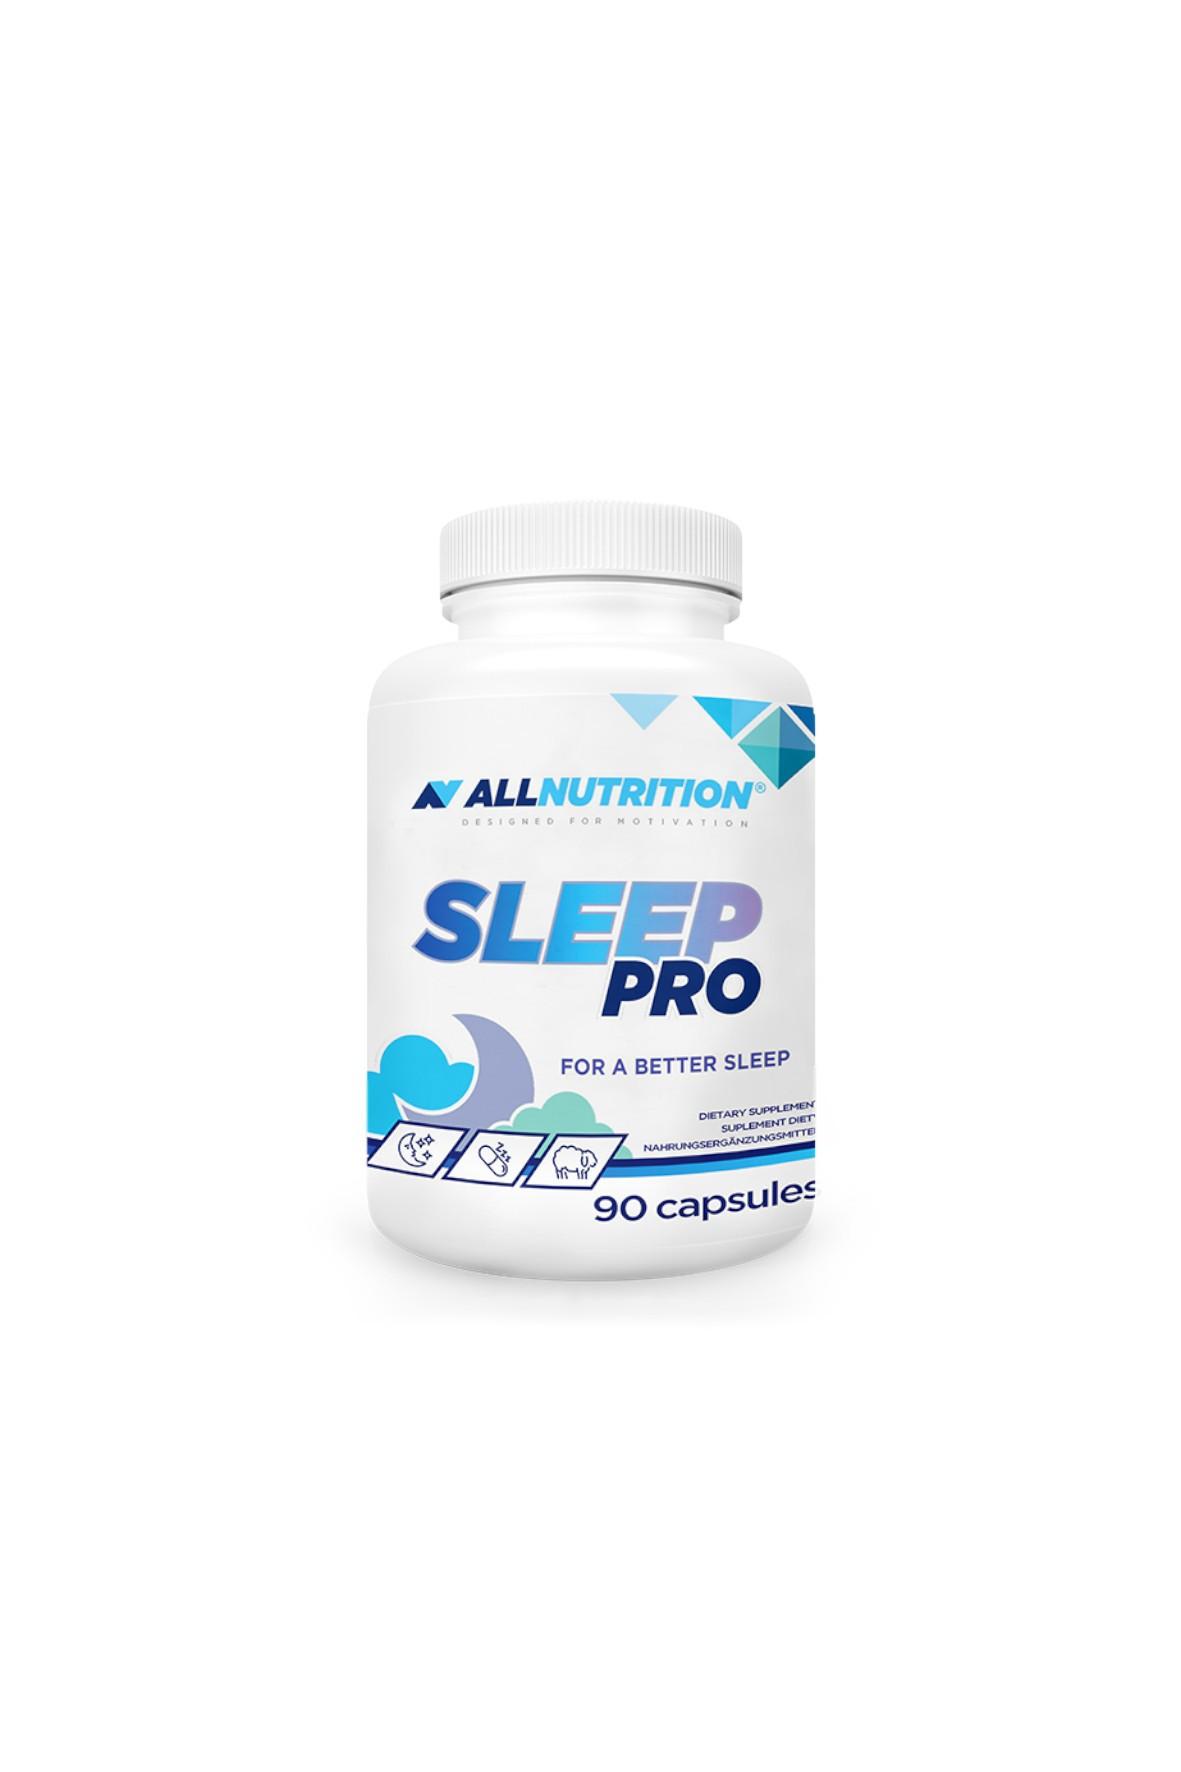 Suplementy diety - Allnutrition Sleep pro - 90 kapsułek